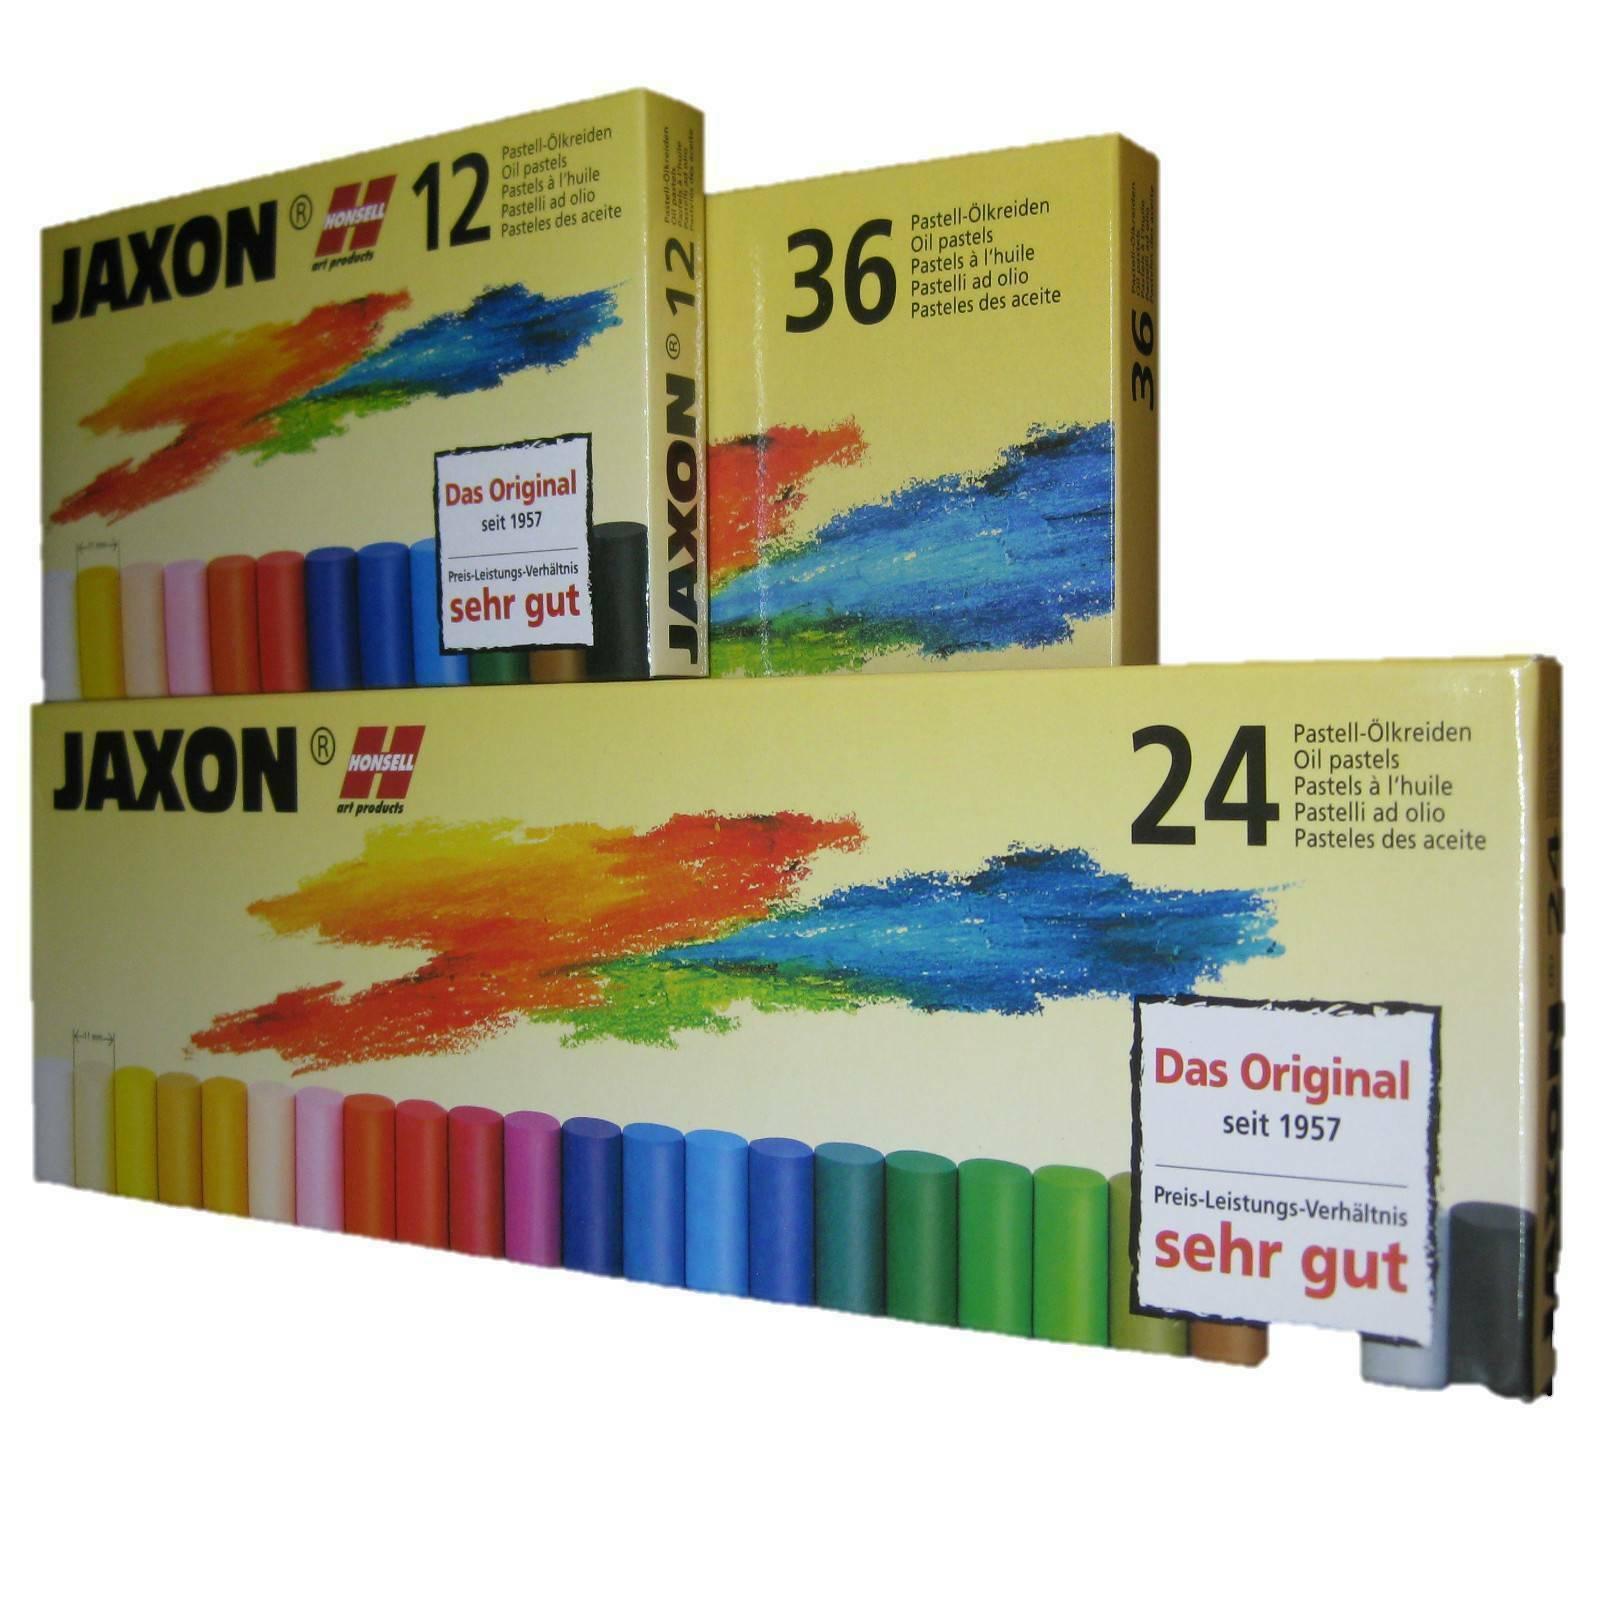 JAXON by Honsell Kreide Ölpastellkreide 12er Set 47460 NEU